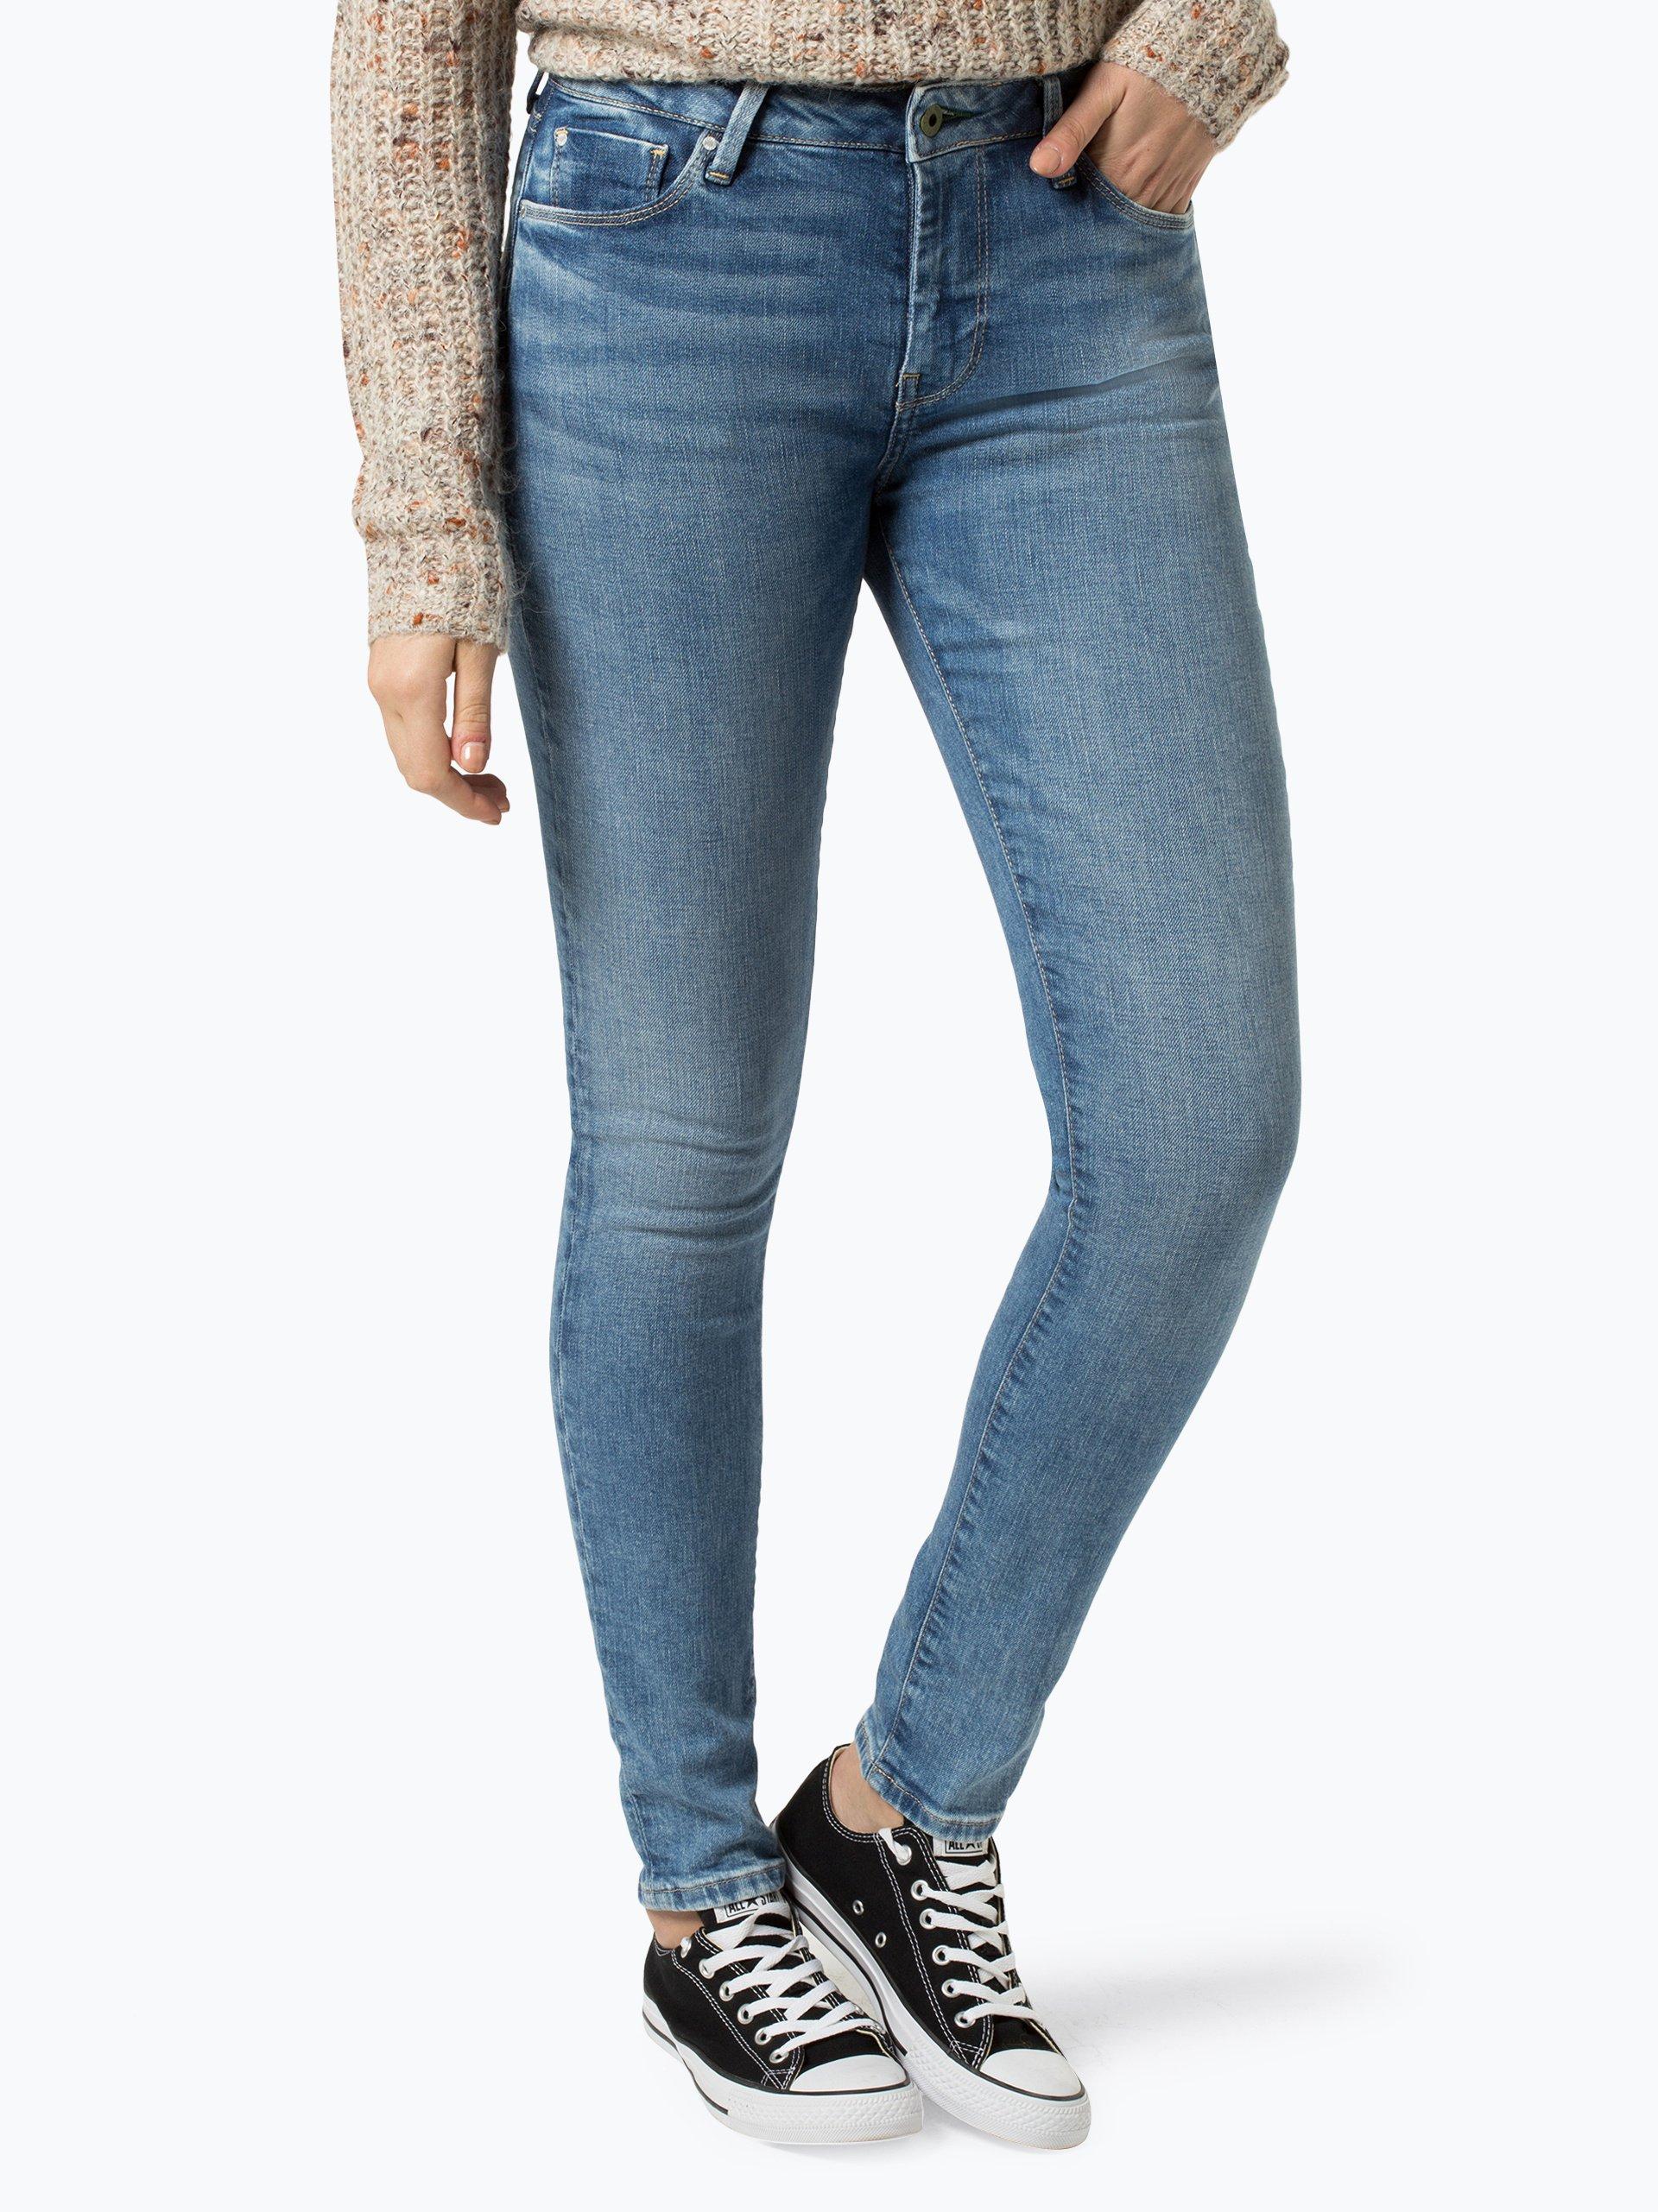 Pepe Jeans Damen Jeans - Regent